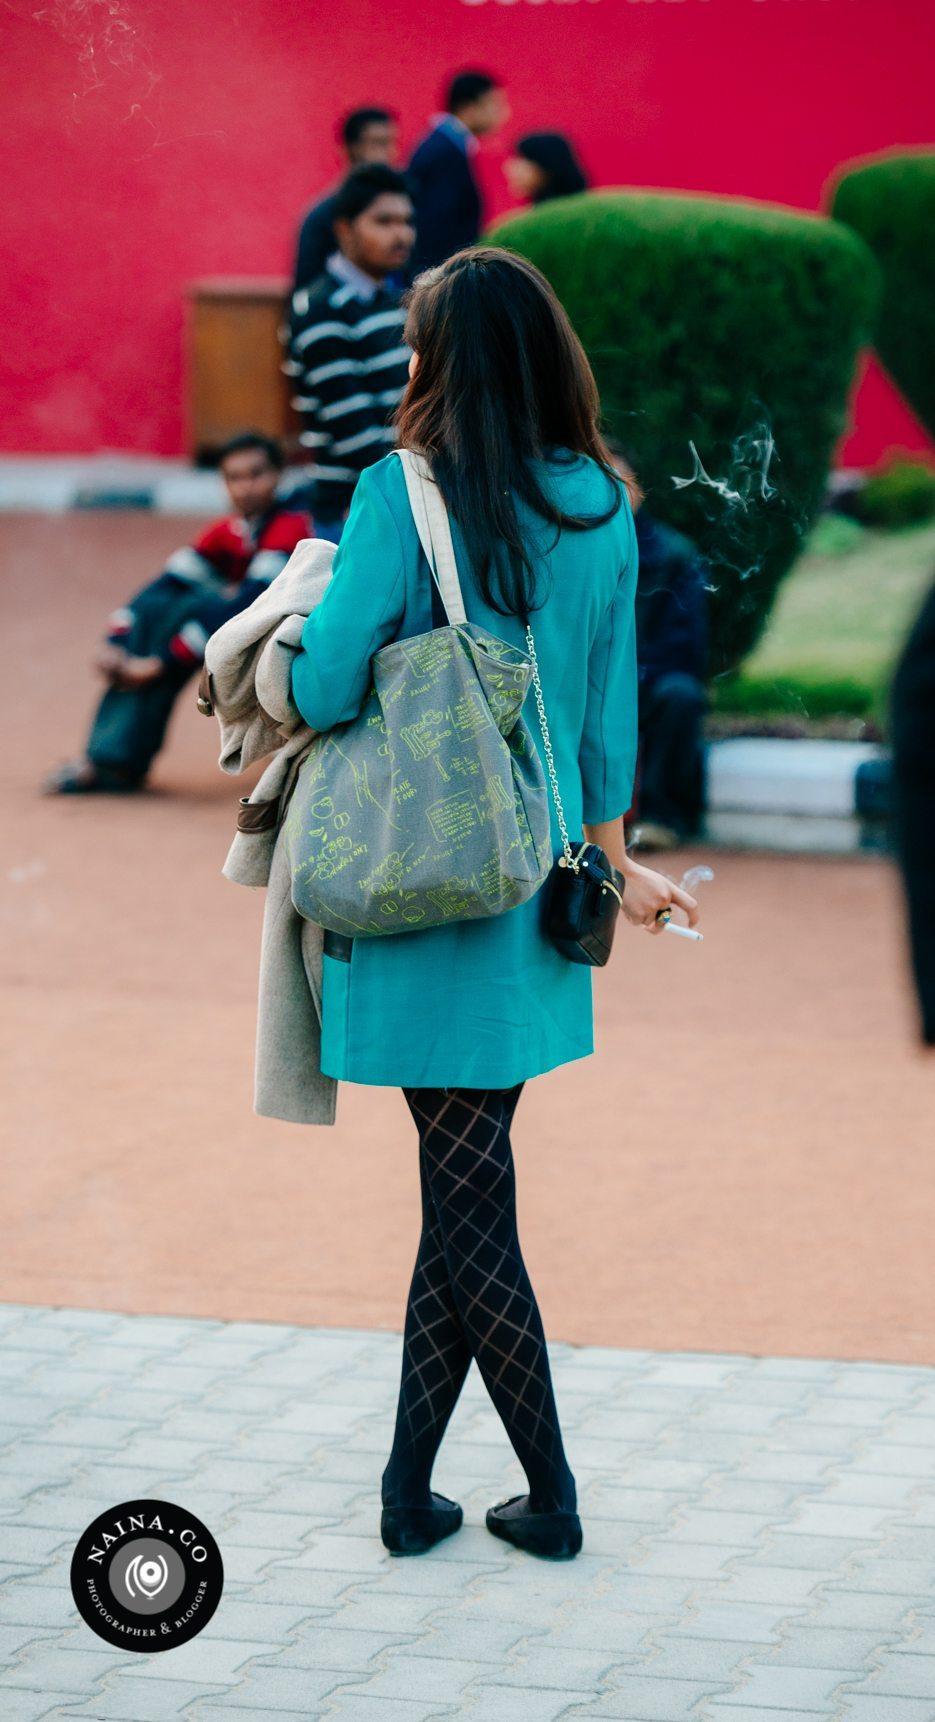 Naina.co-Raconteuse-Visuelle-Photographer-Blogger-Storyteller-Luxury-Lifestyle-January-2015-Le-Meridien-India-Art-Fair-Coffee-EyesForStreetSstyle-03